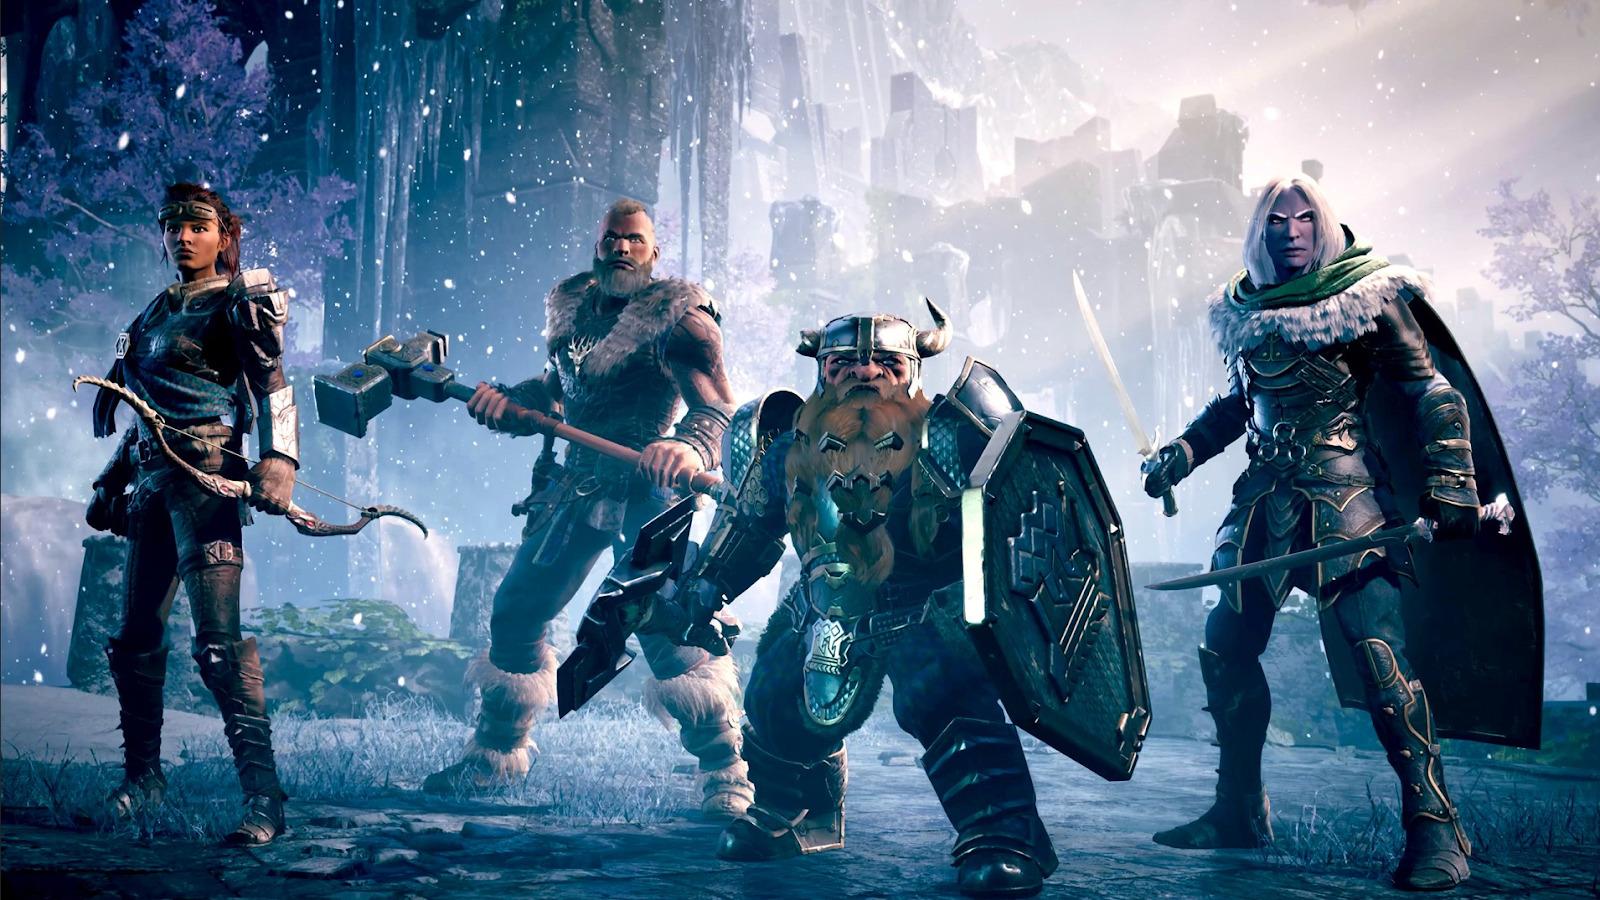 buy Dungeons & Dragons: Dark Alliance game price